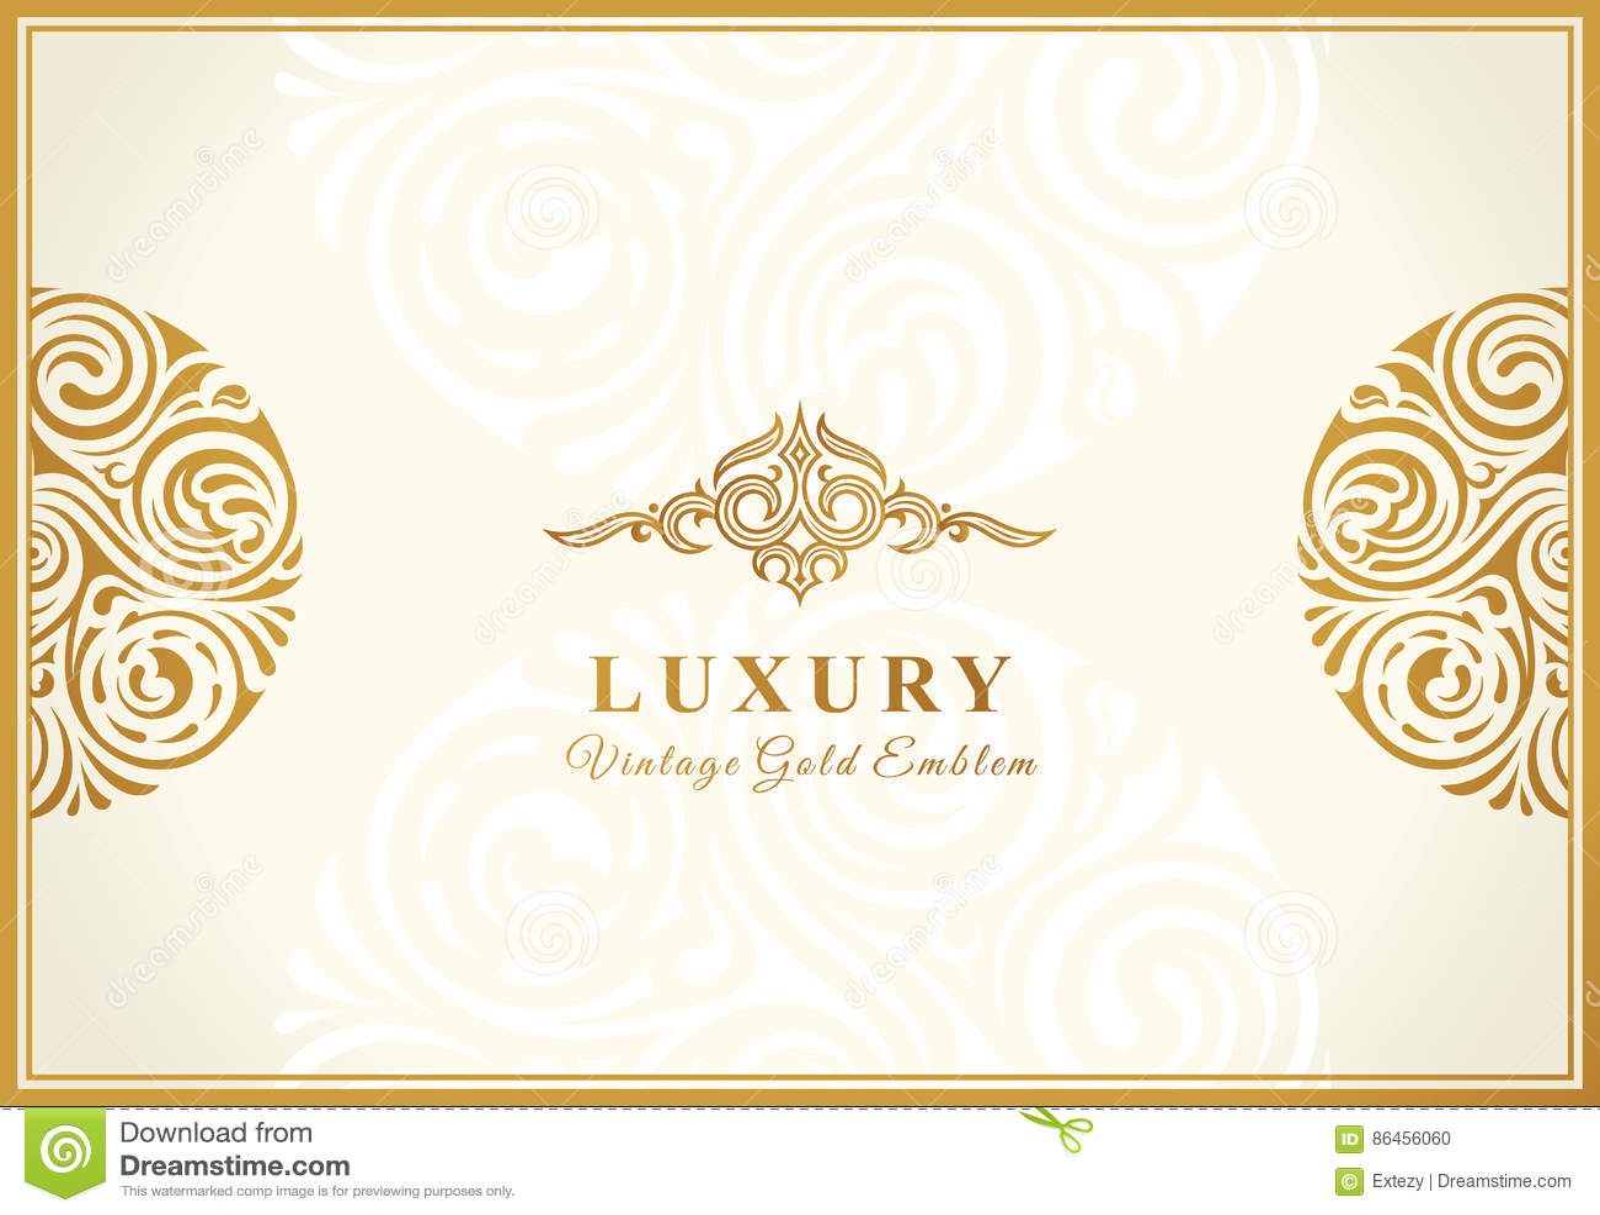 Penguin Book Cover Wedding Invitation Template : Islamic ramadan template greeting royalty free